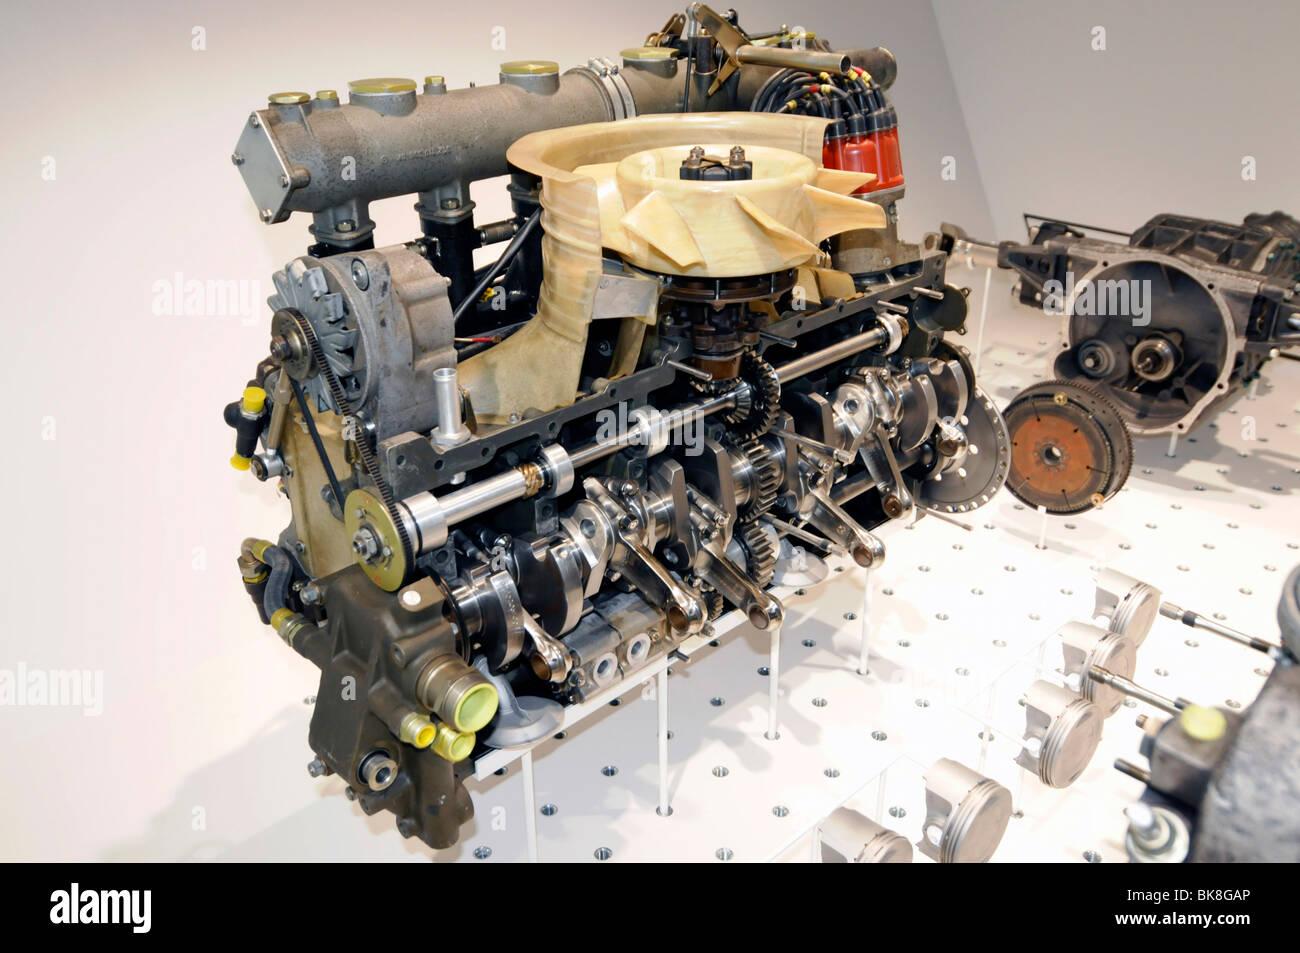 Porsche 6-cylinder engine disassembled, Neues Porschemuseum, New Porsche Museum, 2009, Stuttgart, Baden-Wuerttemberg, - Stock Image